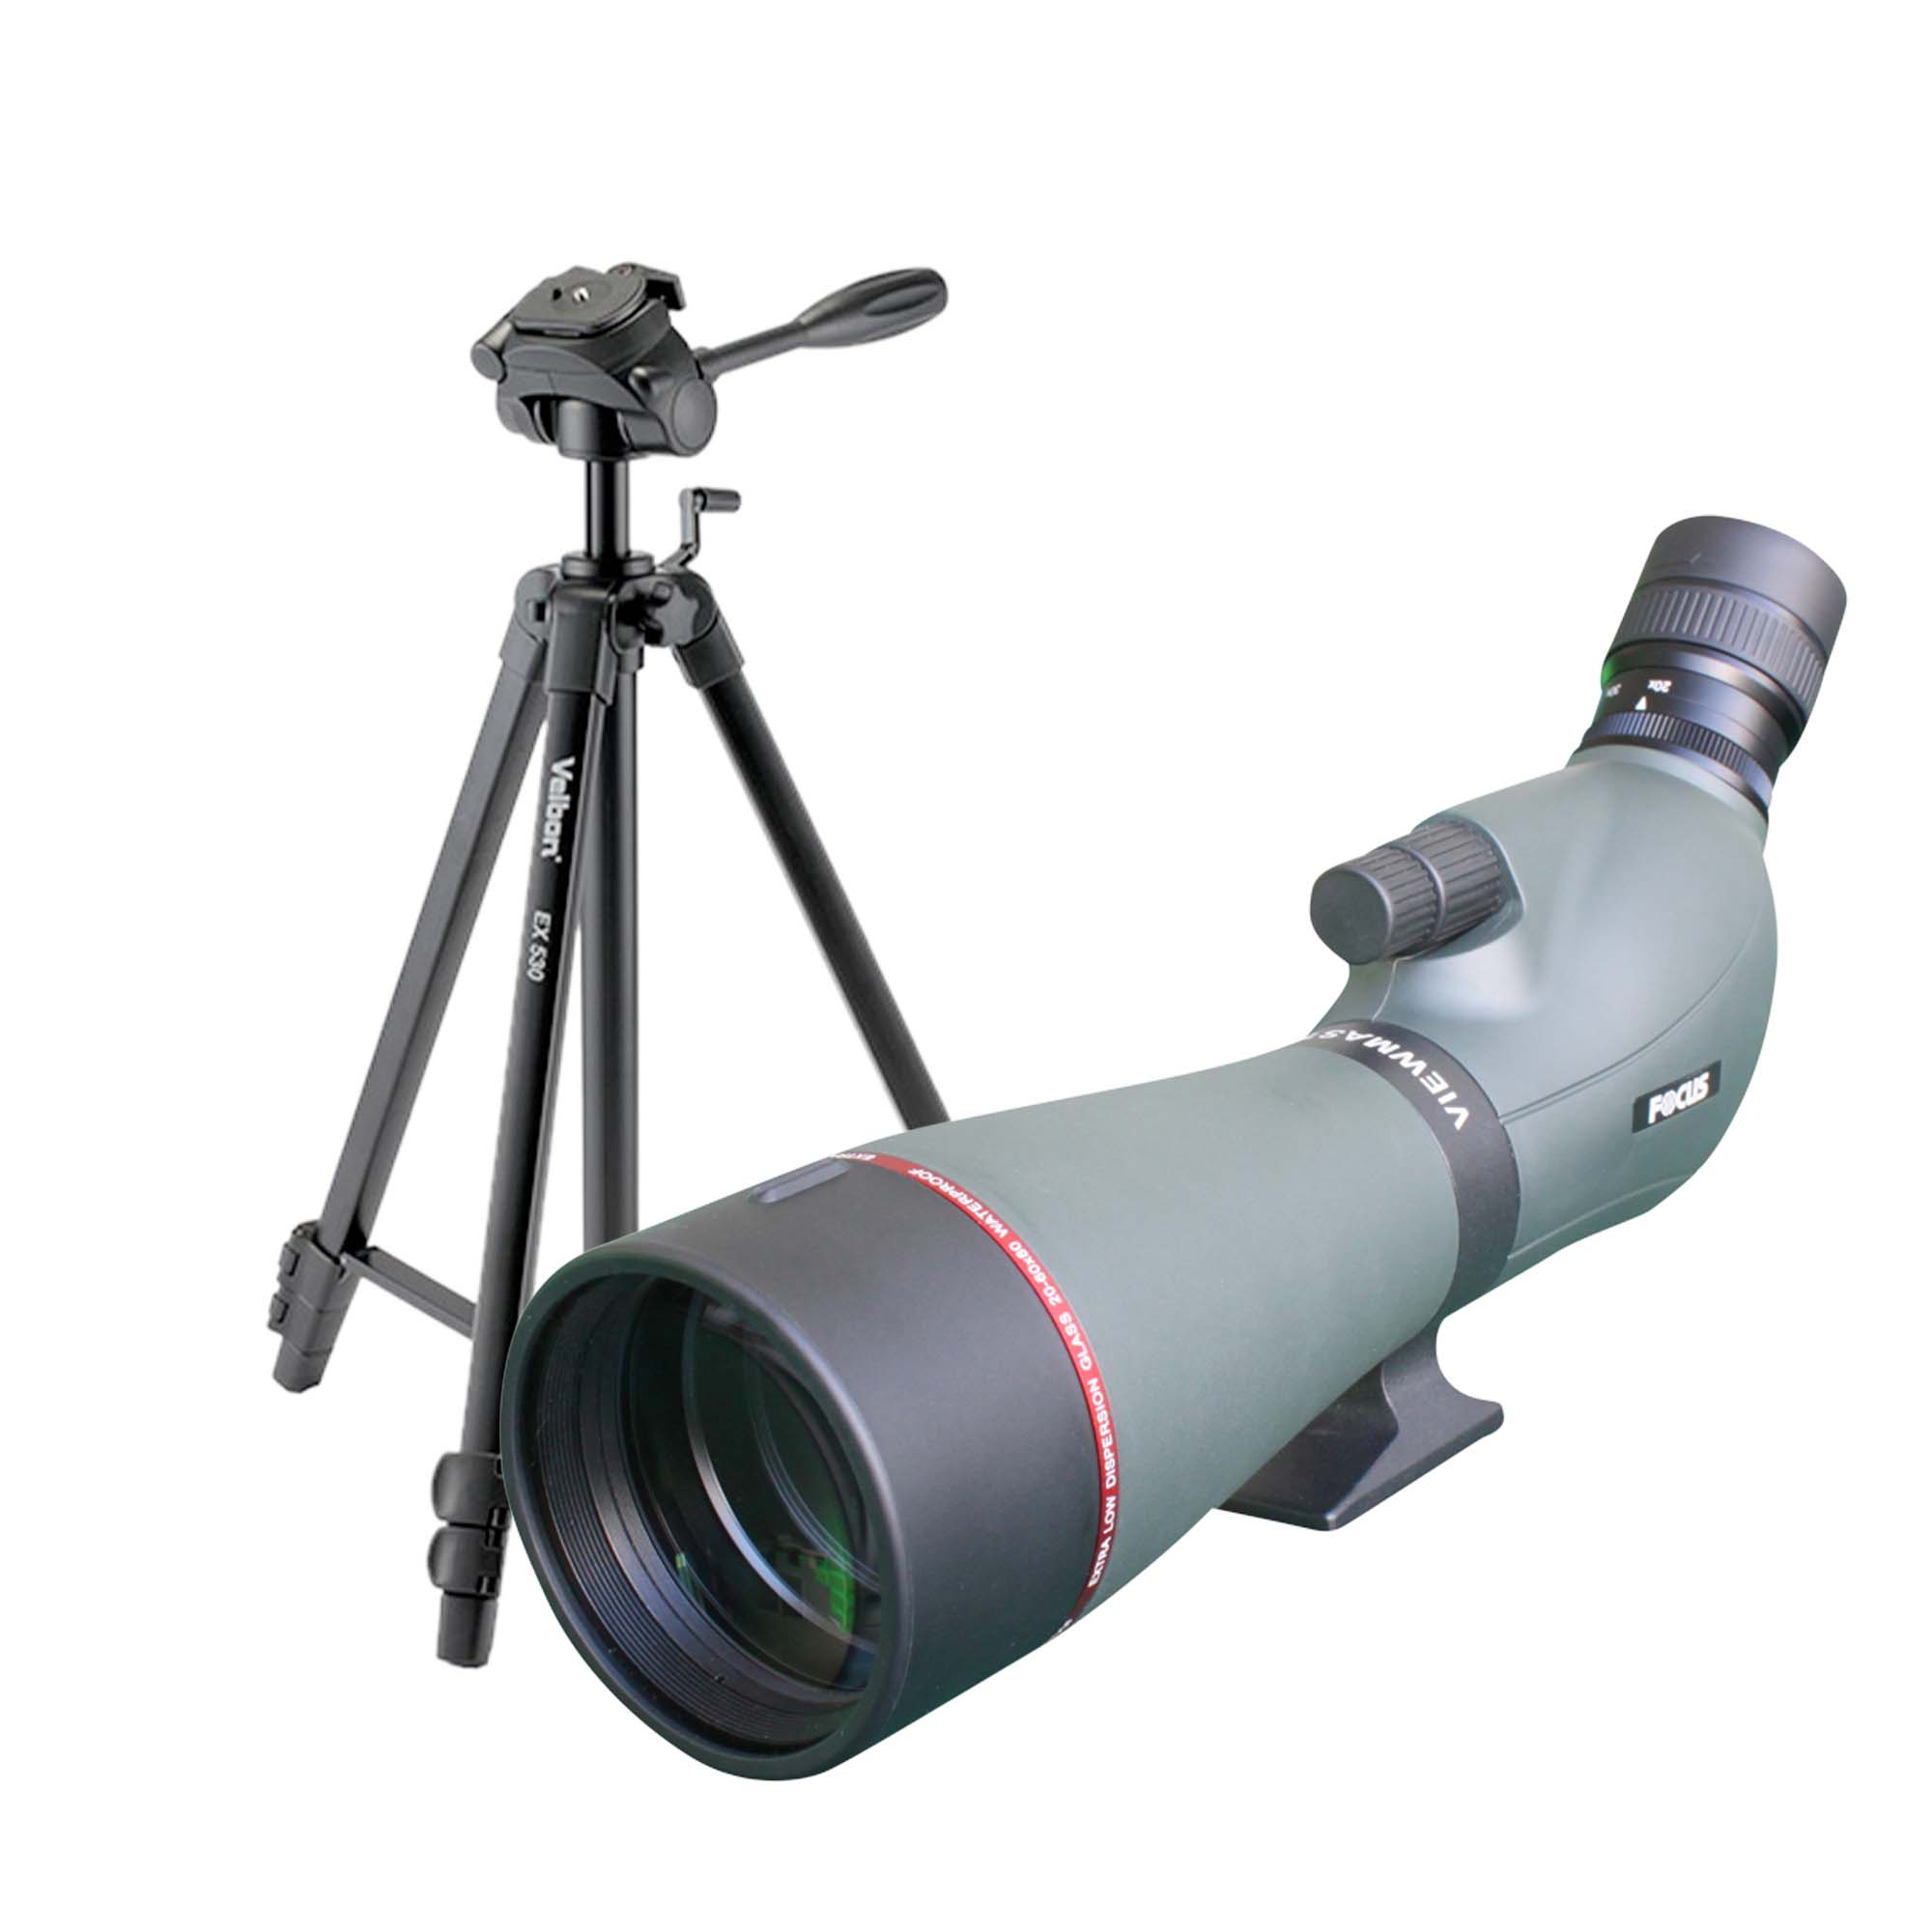 Focus Viewmaster 20-60x80 + Velbon EX-530